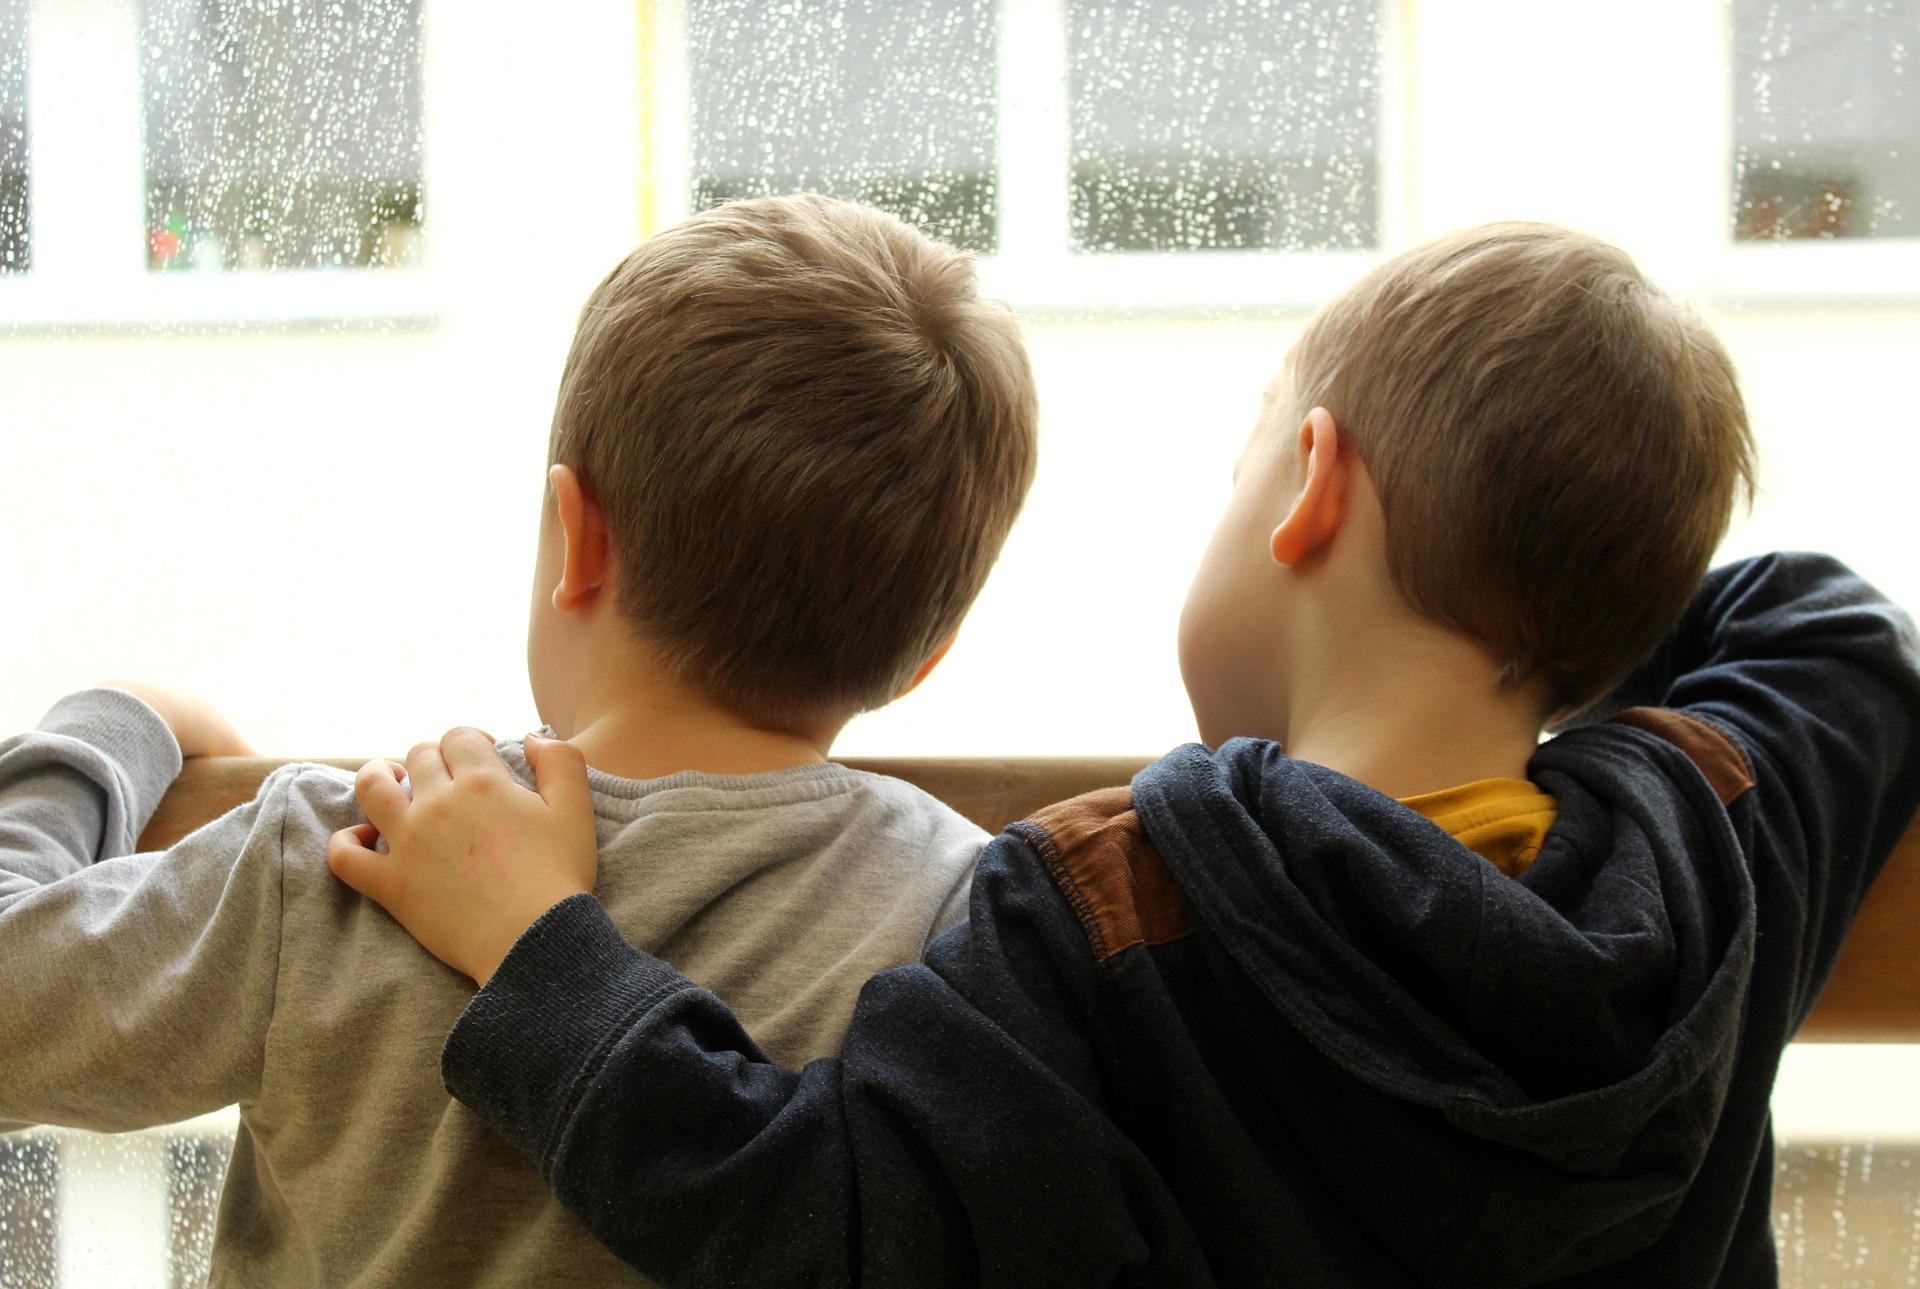 children-4882350_1920.jpg